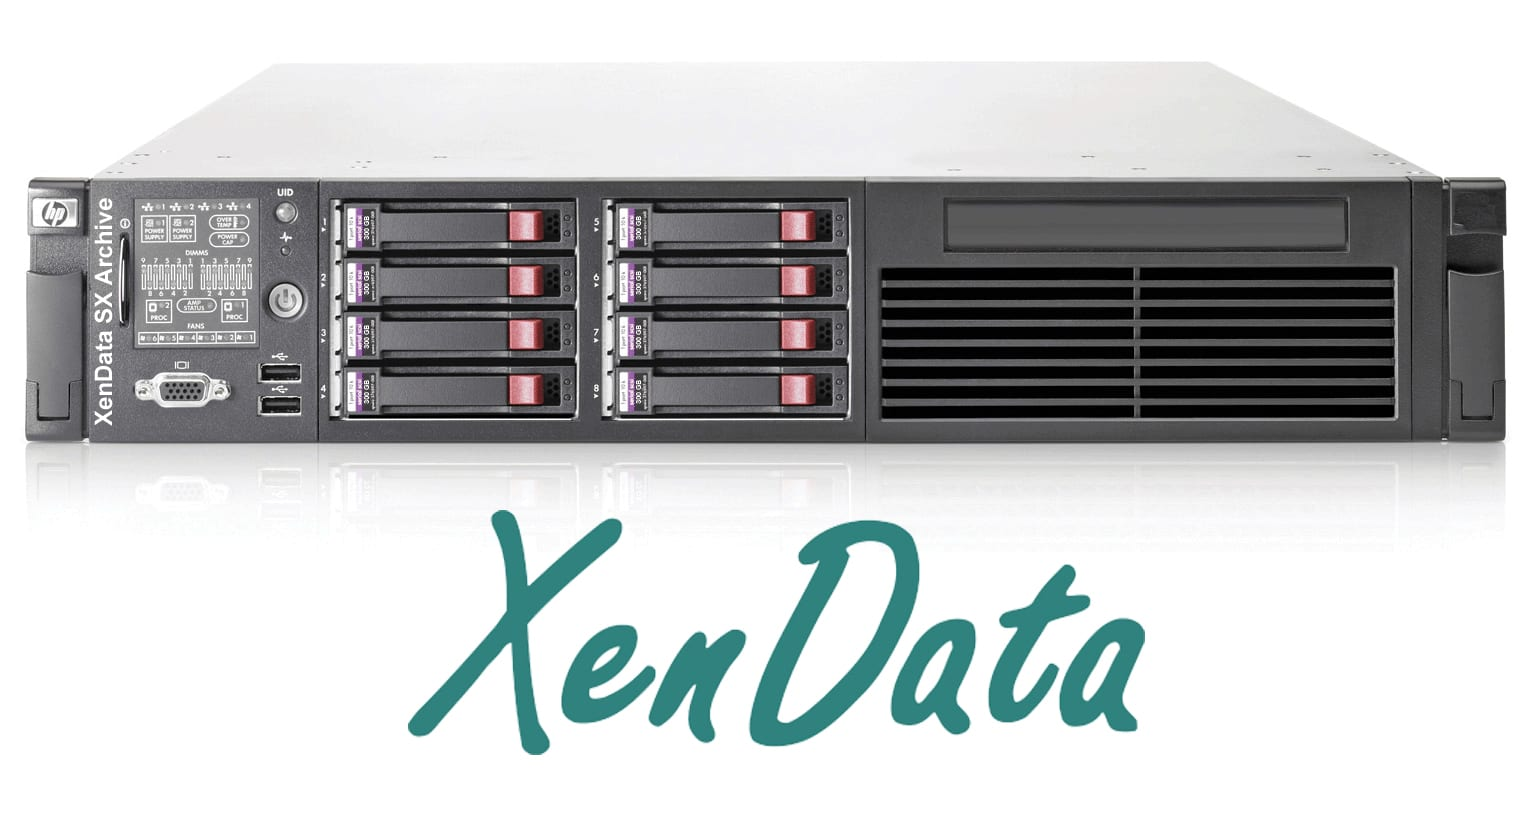 Xendata_Archiving